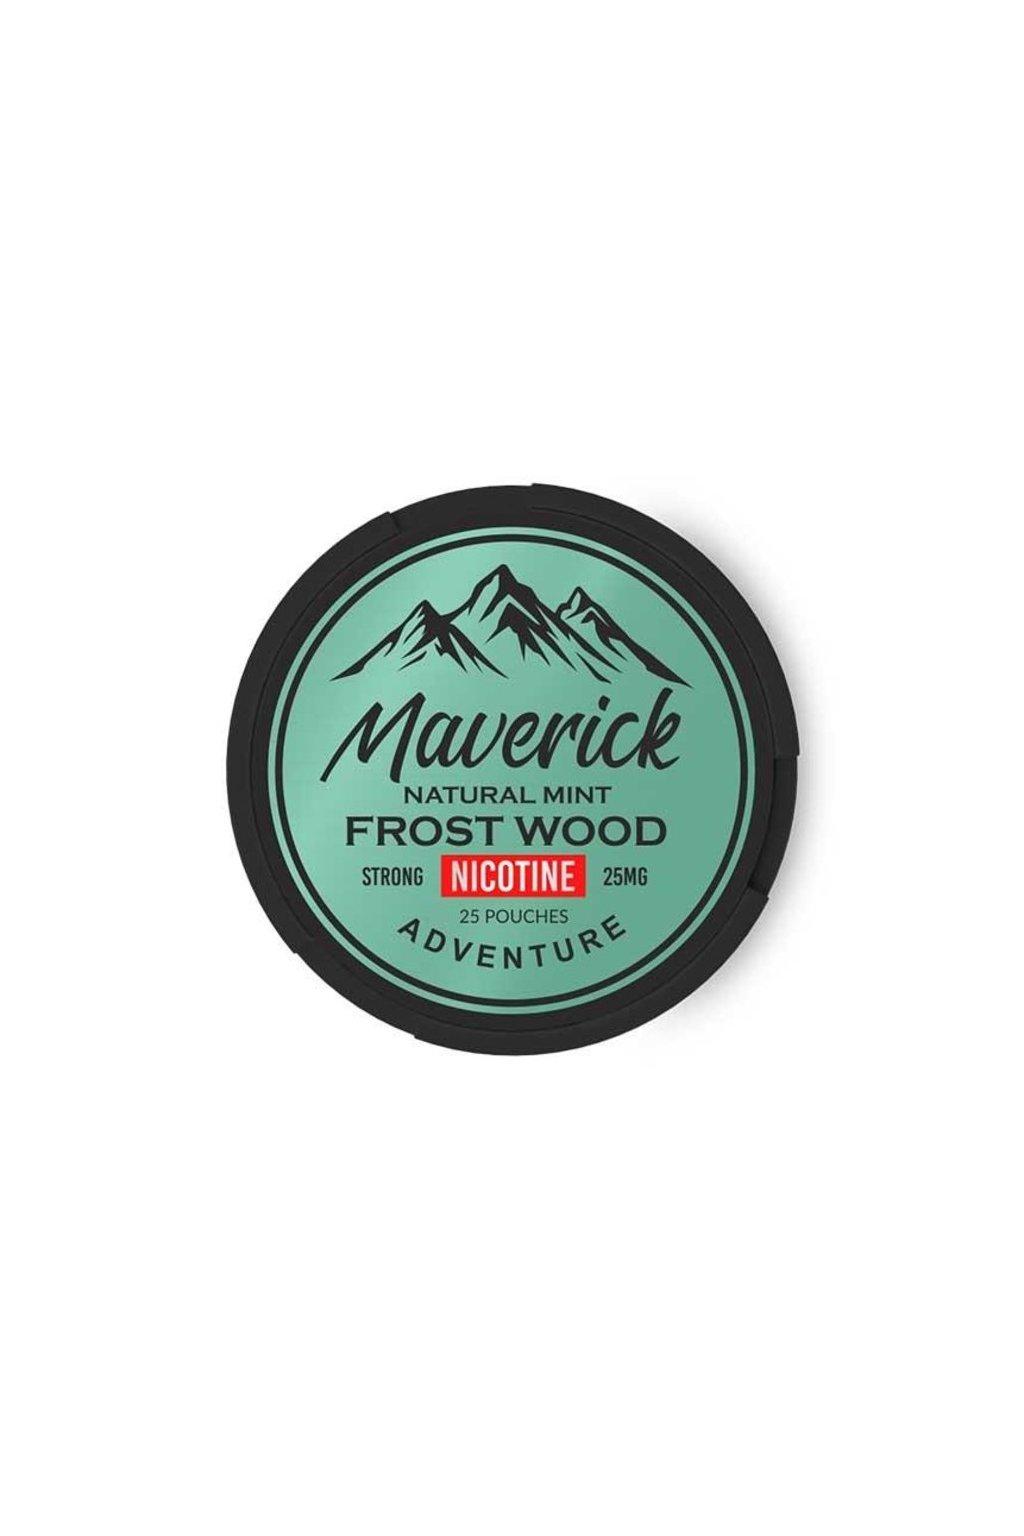 nikotinove sacky maverick frost wood nicopods min